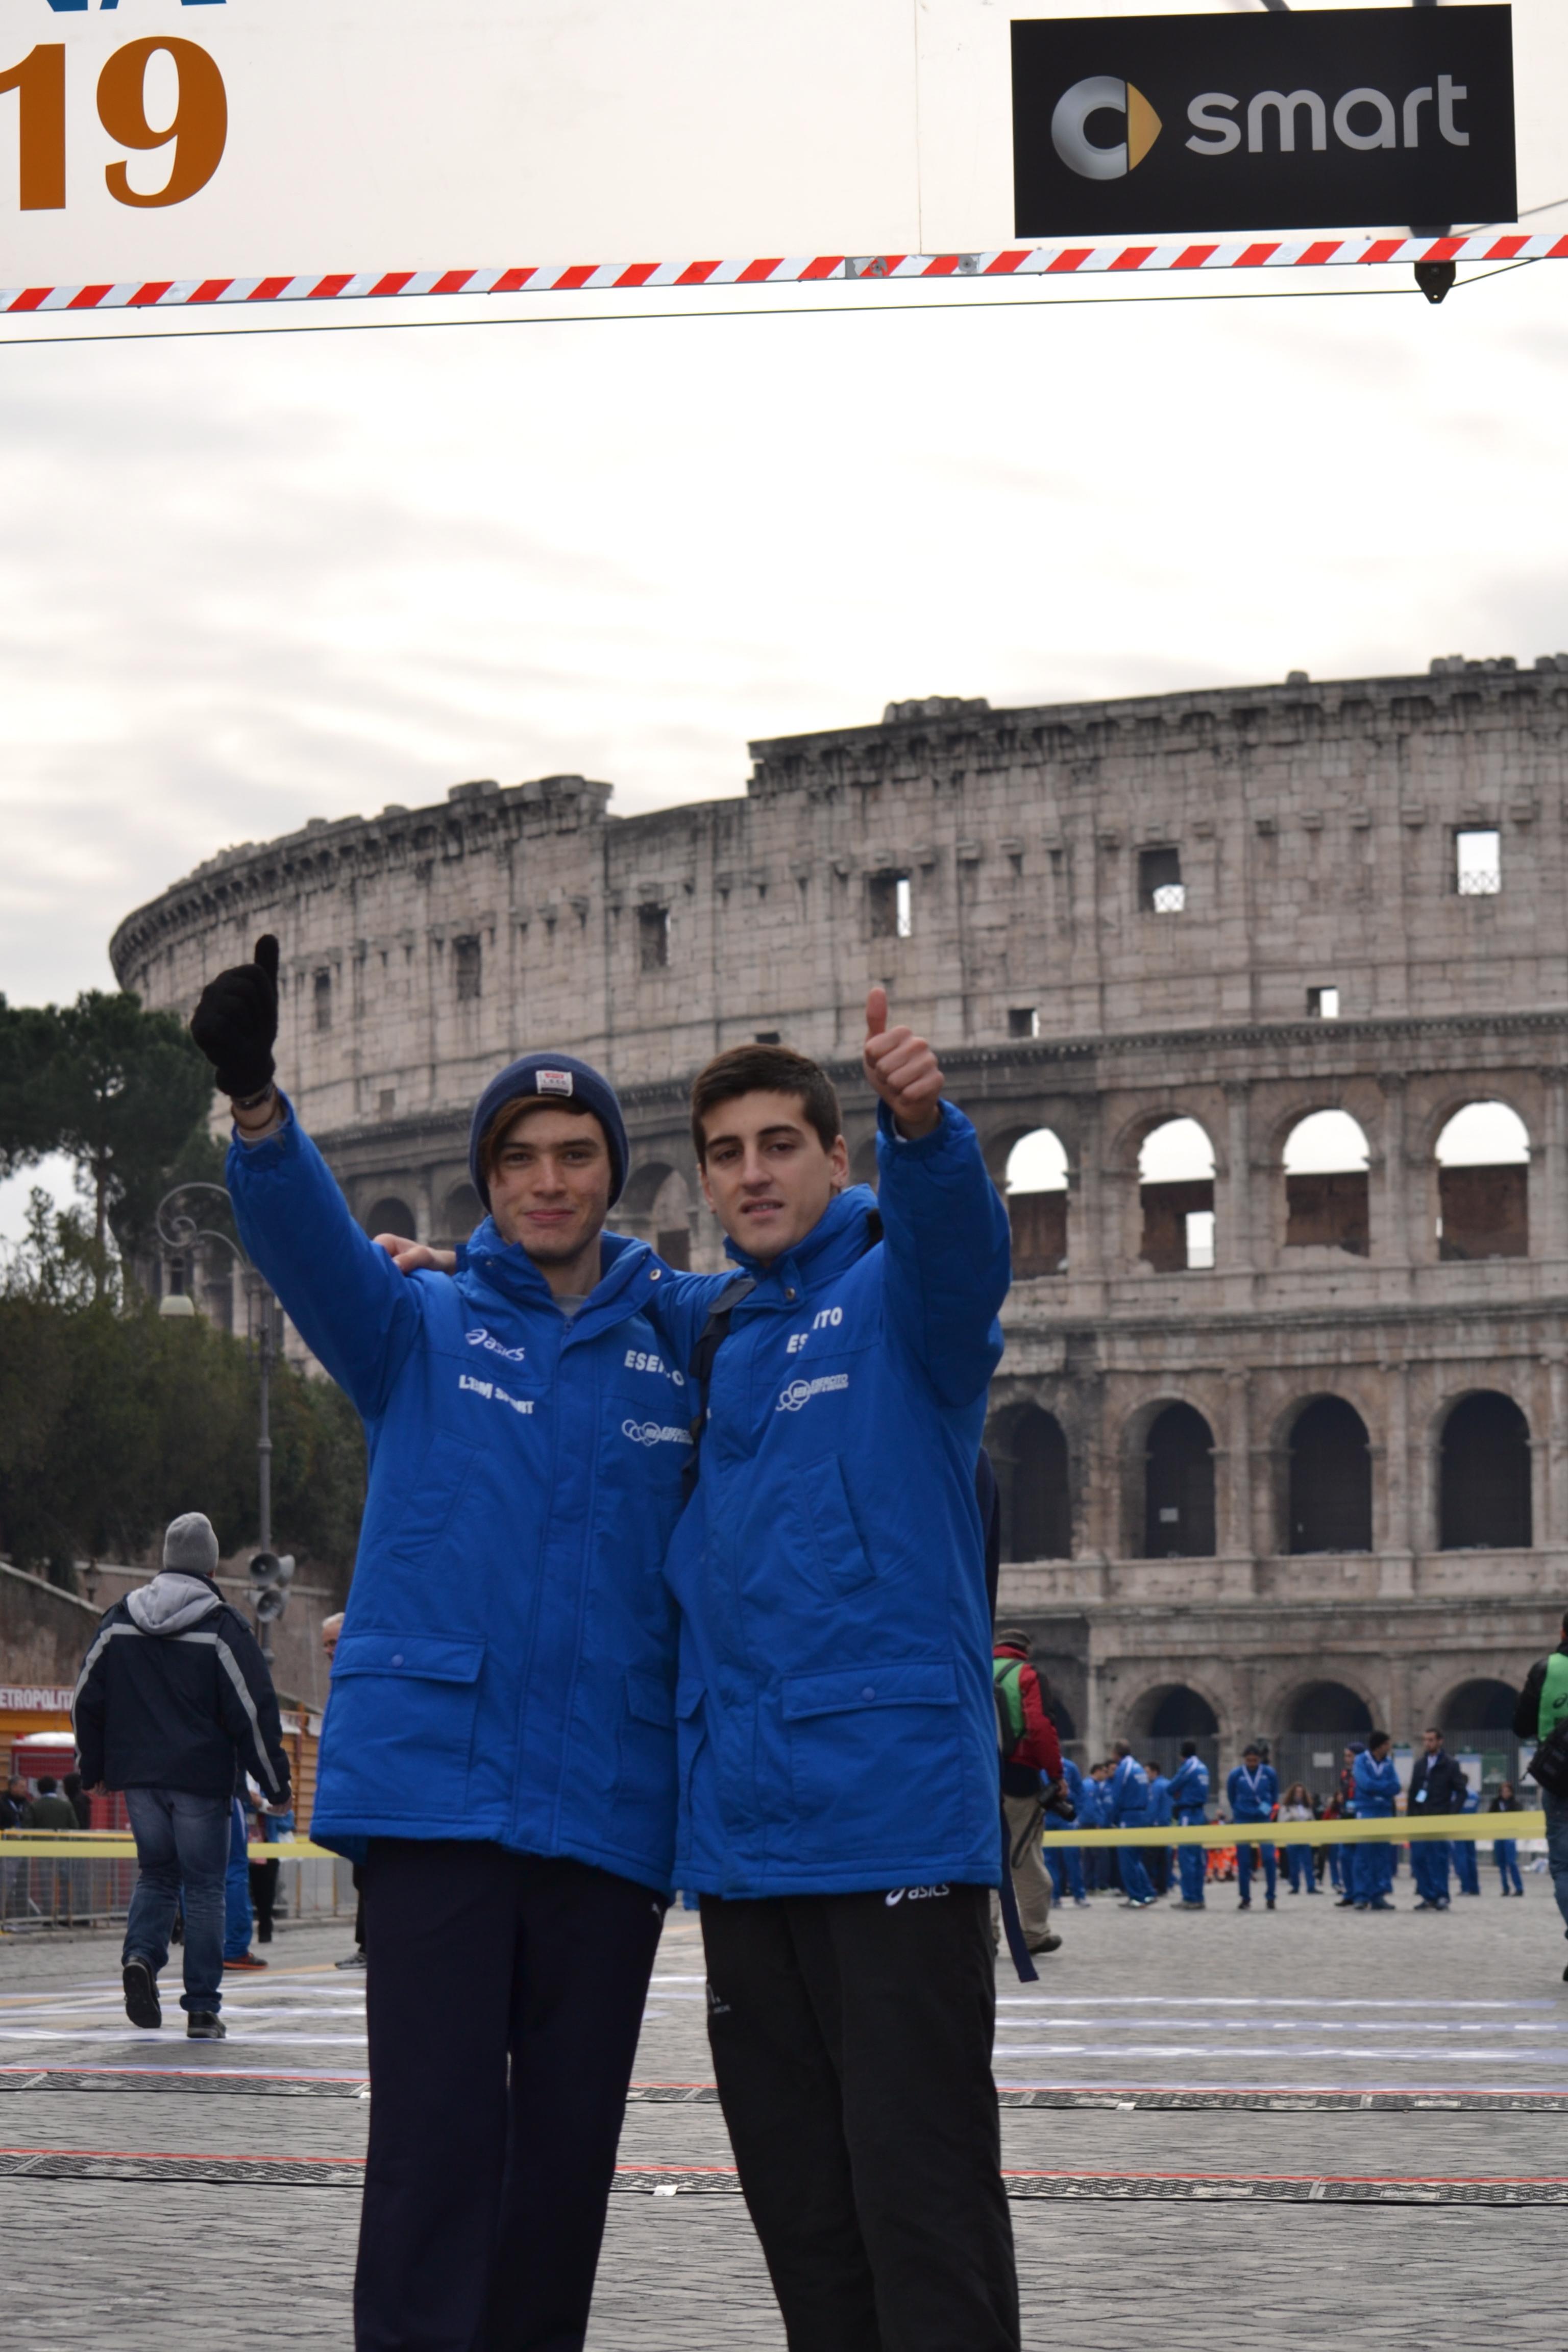 maratona-di-roma-2013-065